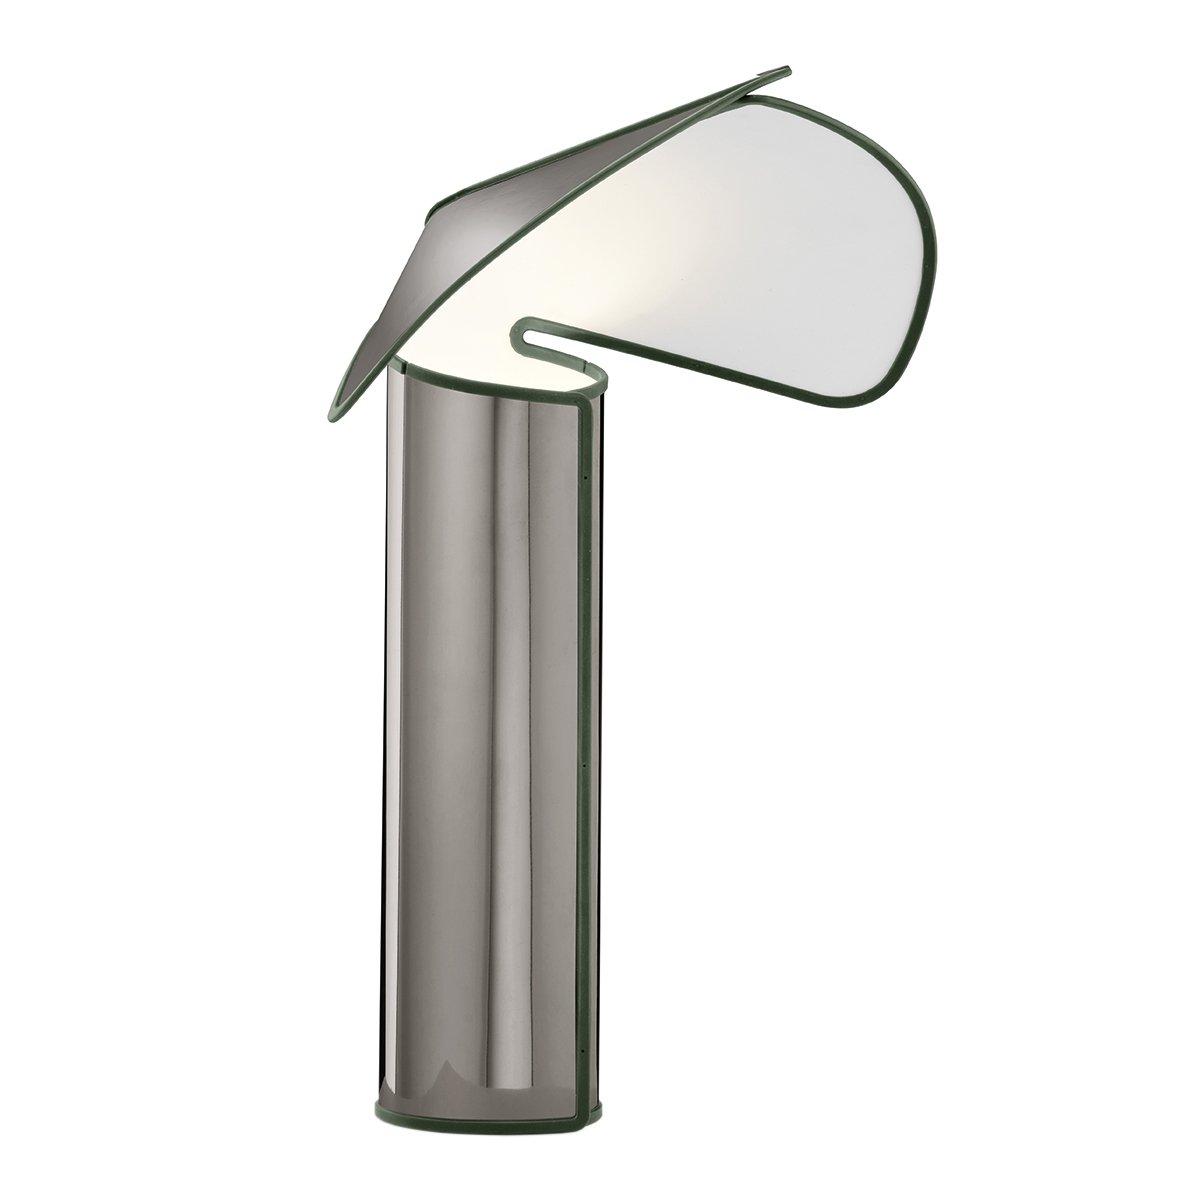 FLOS Chiara Tafellamp - Donkergrijs - Olijfgroen